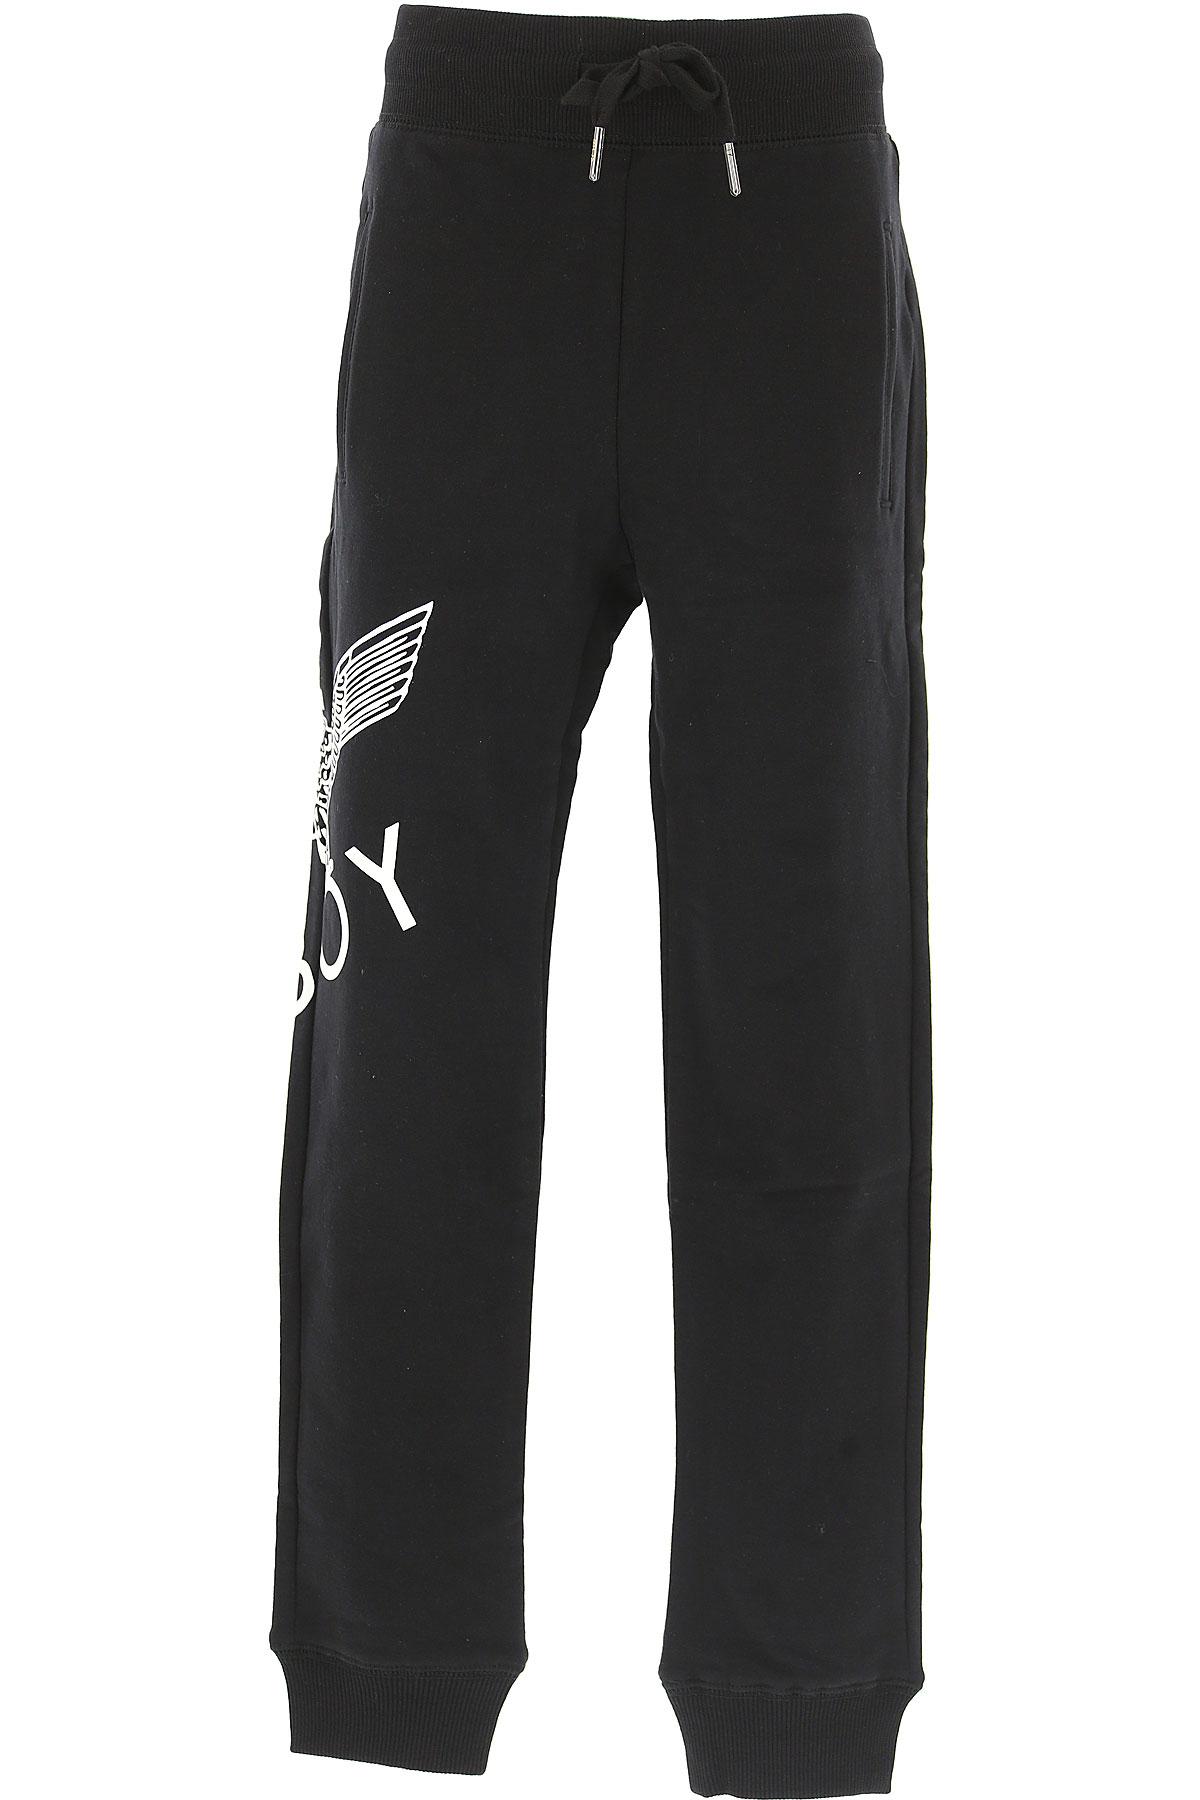 Boy London Kids Sweatpants for Boys On Sale, Black, Cotton, 2019, 10Y 16Y